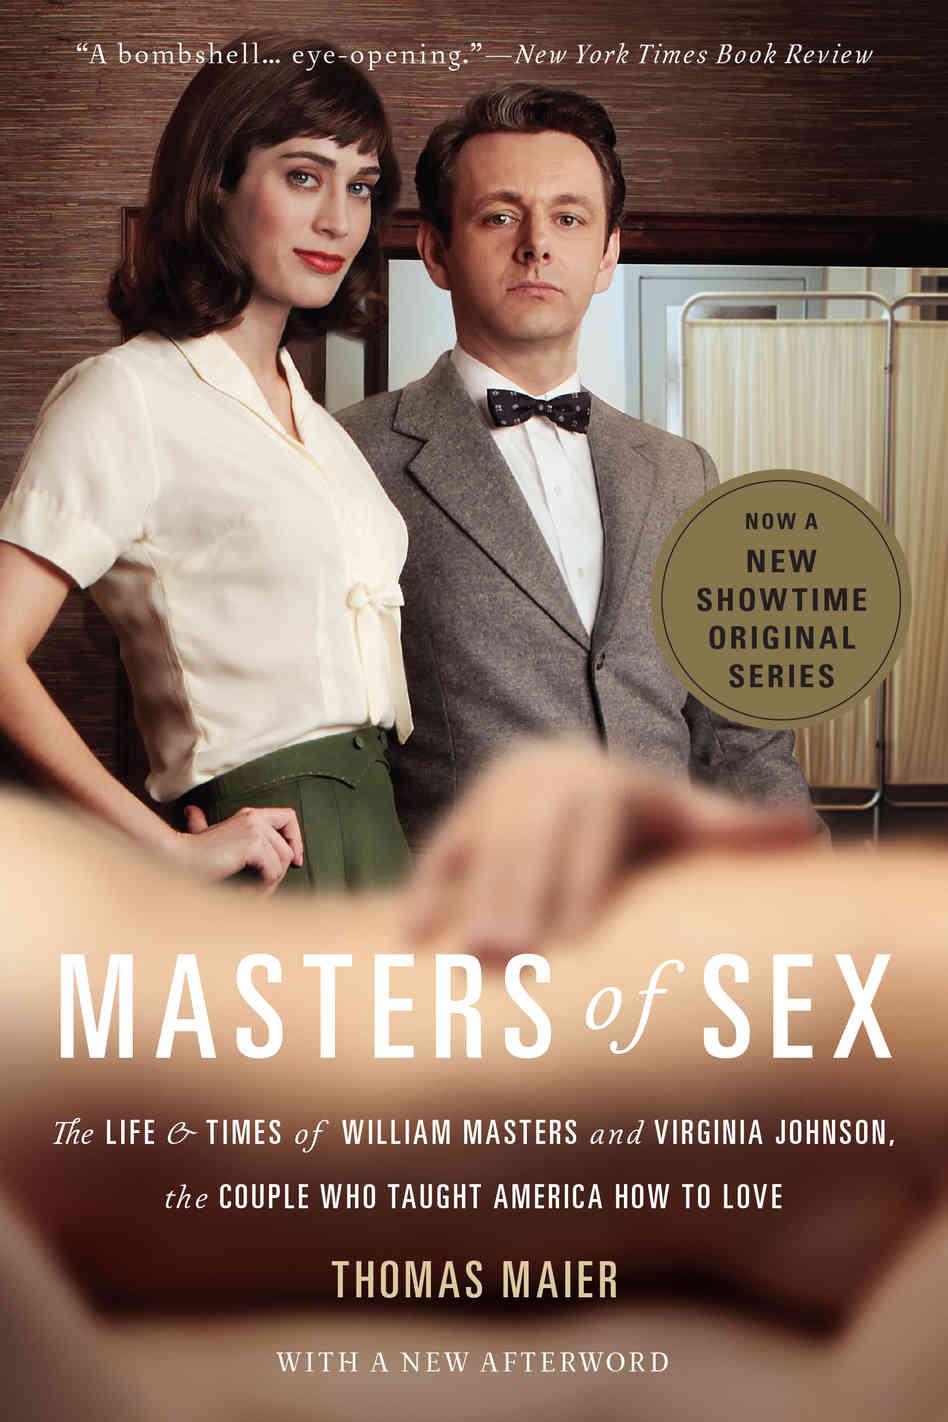 masters-of-sex_custom-0b4bda52b089c78e44553abd2ce239509ff3ca07-s6-c30